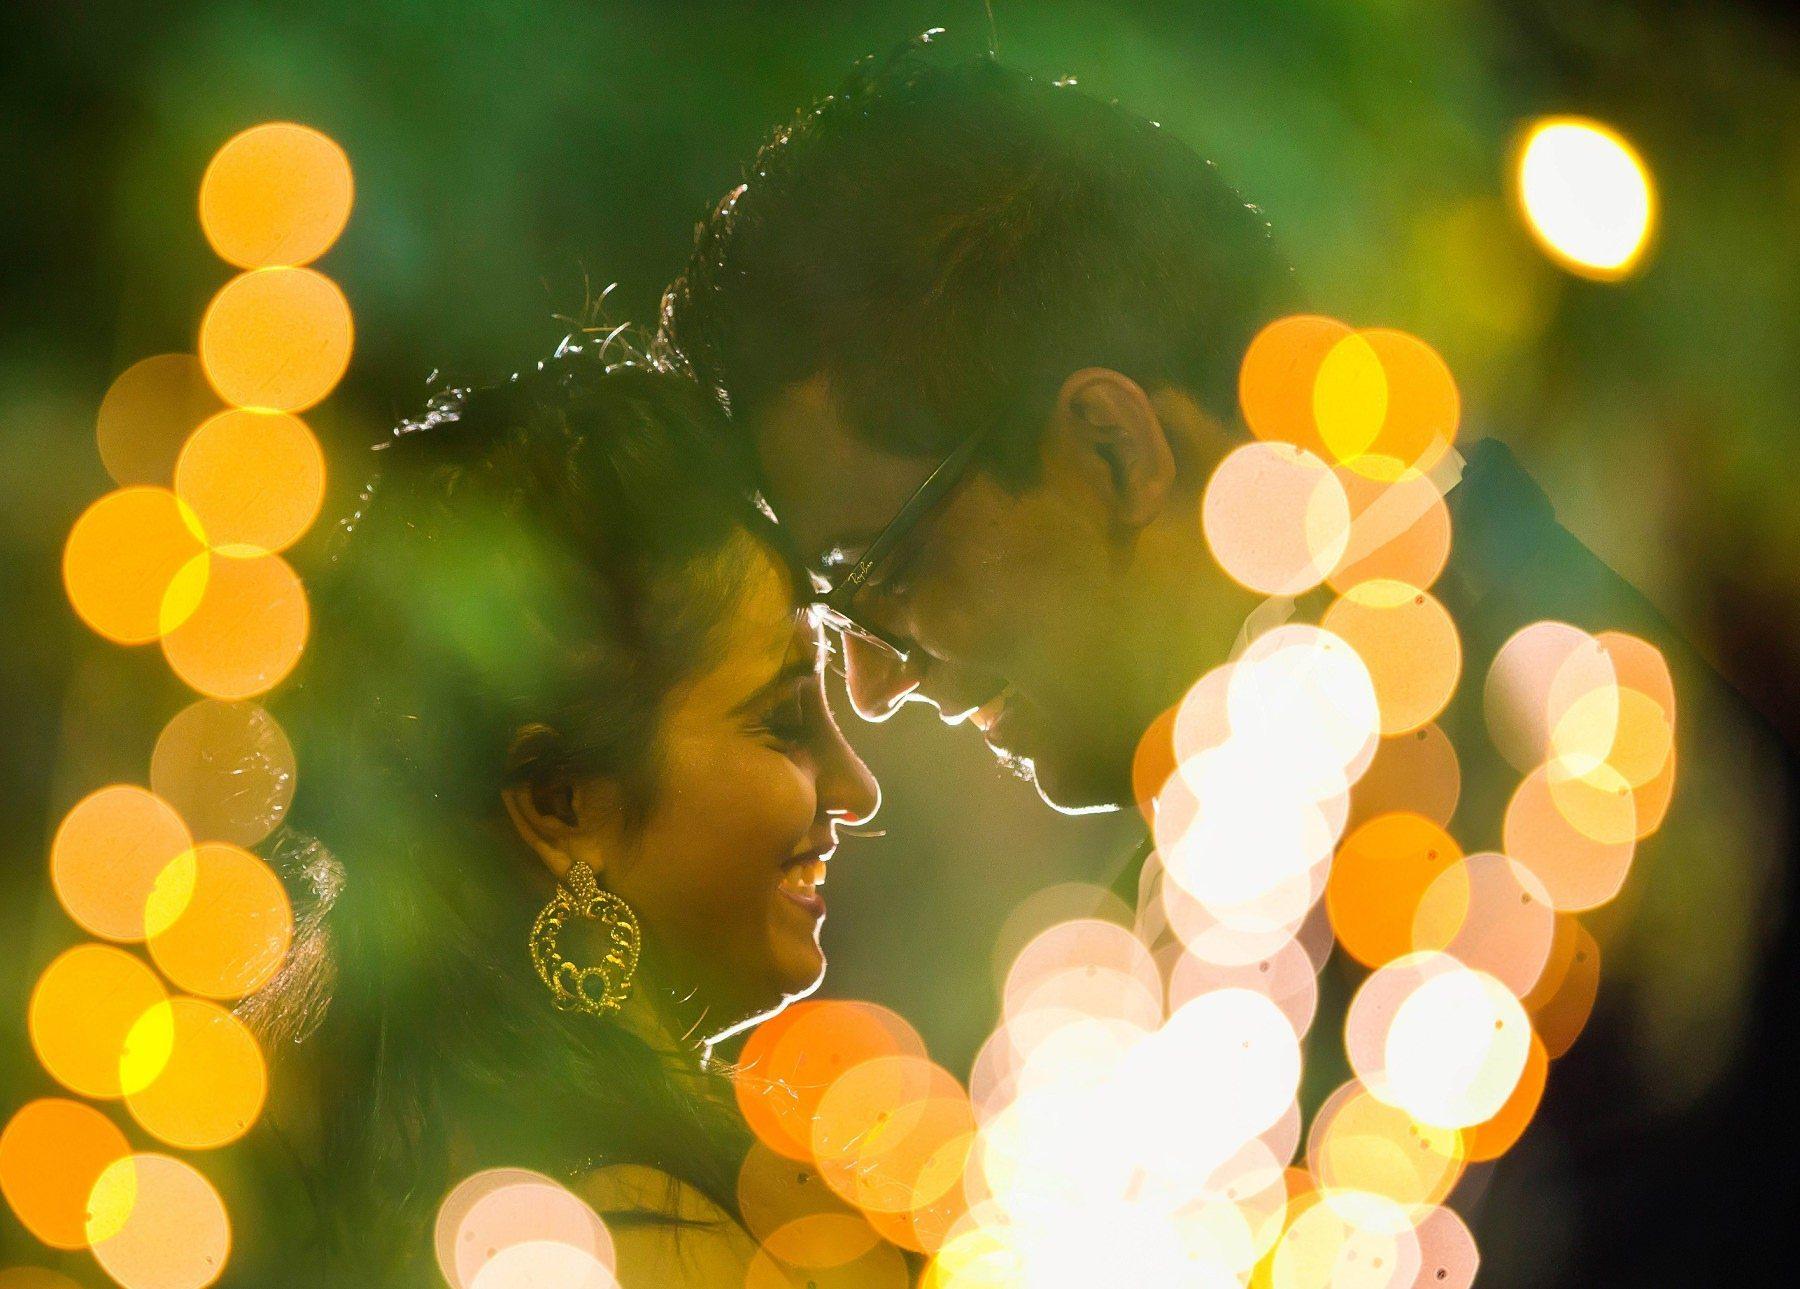 Best Wedding Photographs 2015 - Portraits